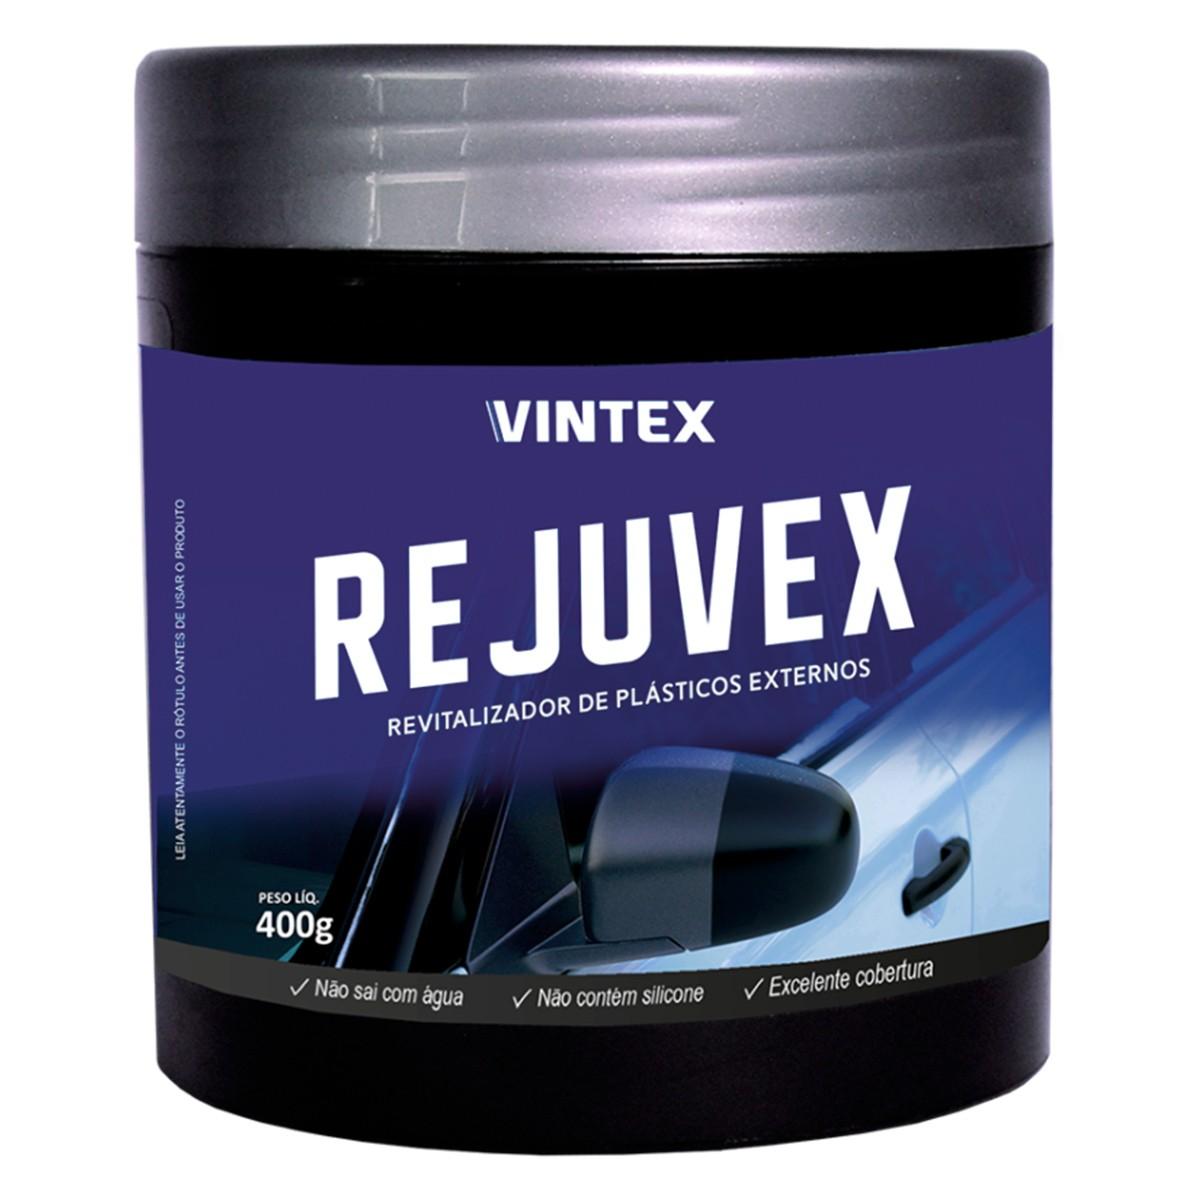 Revitalizador de Plasticos Rejuvex 400g Vintex by Vonixx